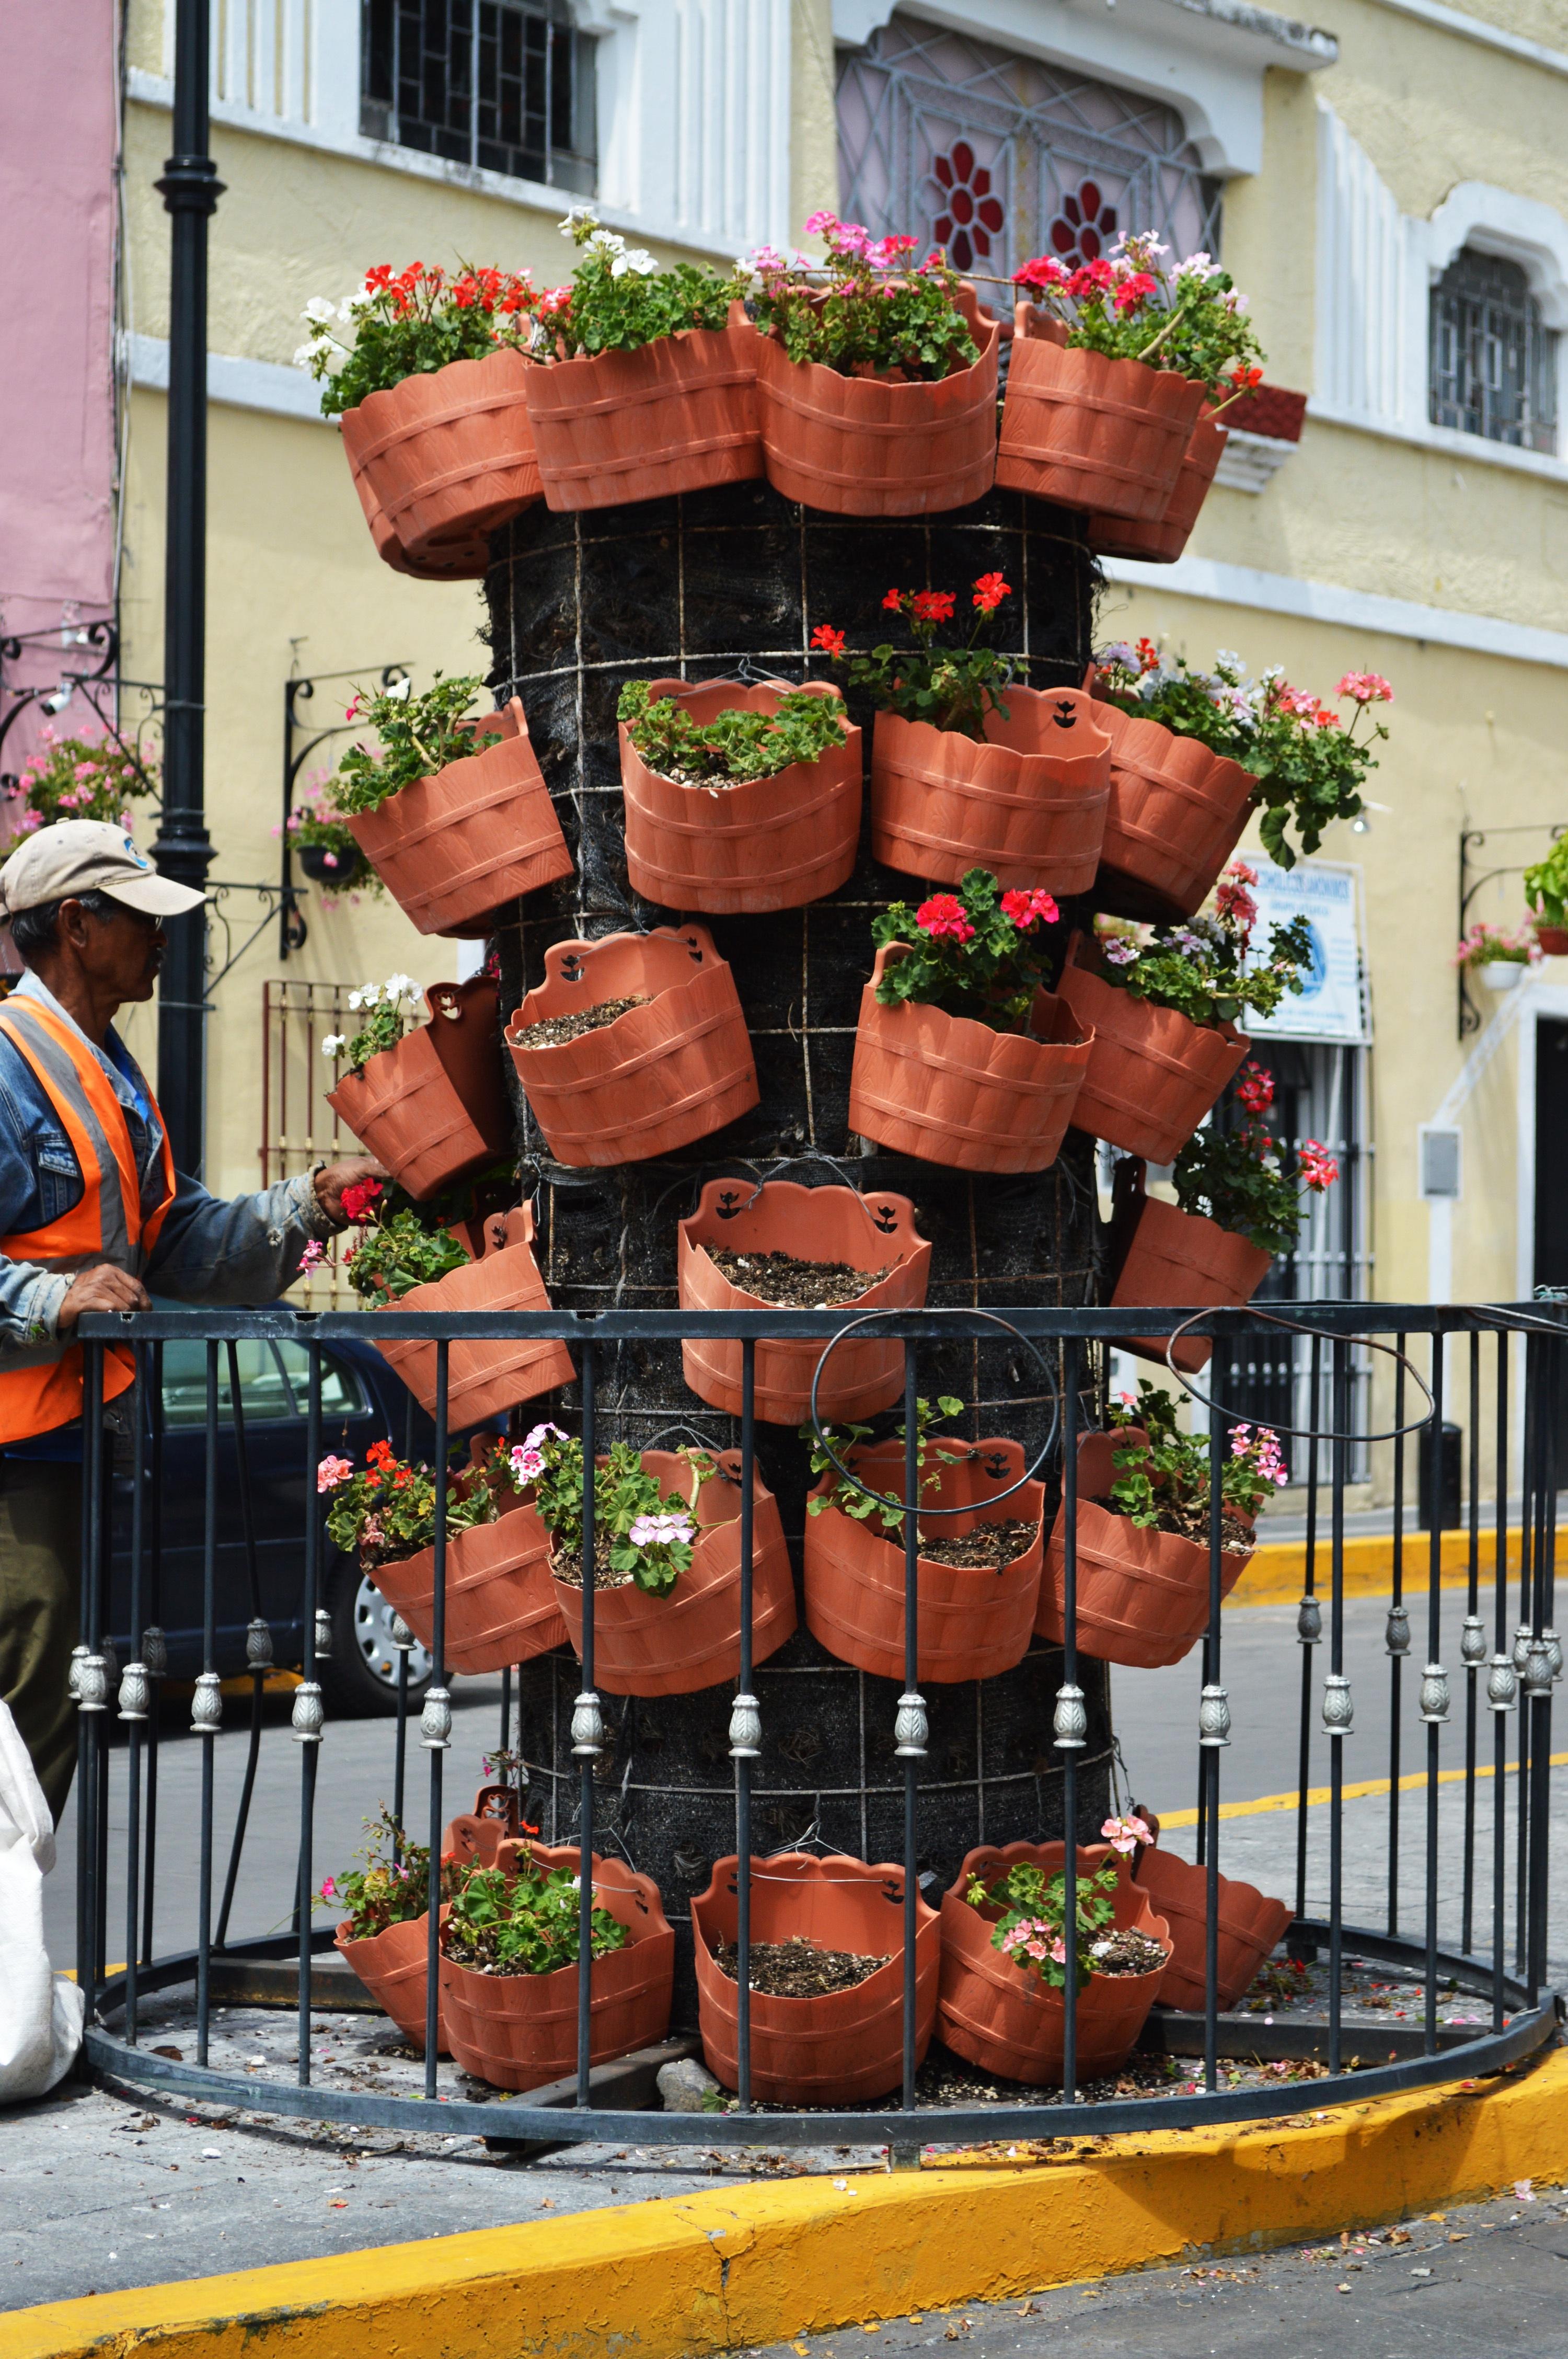 handmade pots decorative deeper artistic interior plants green decor original for